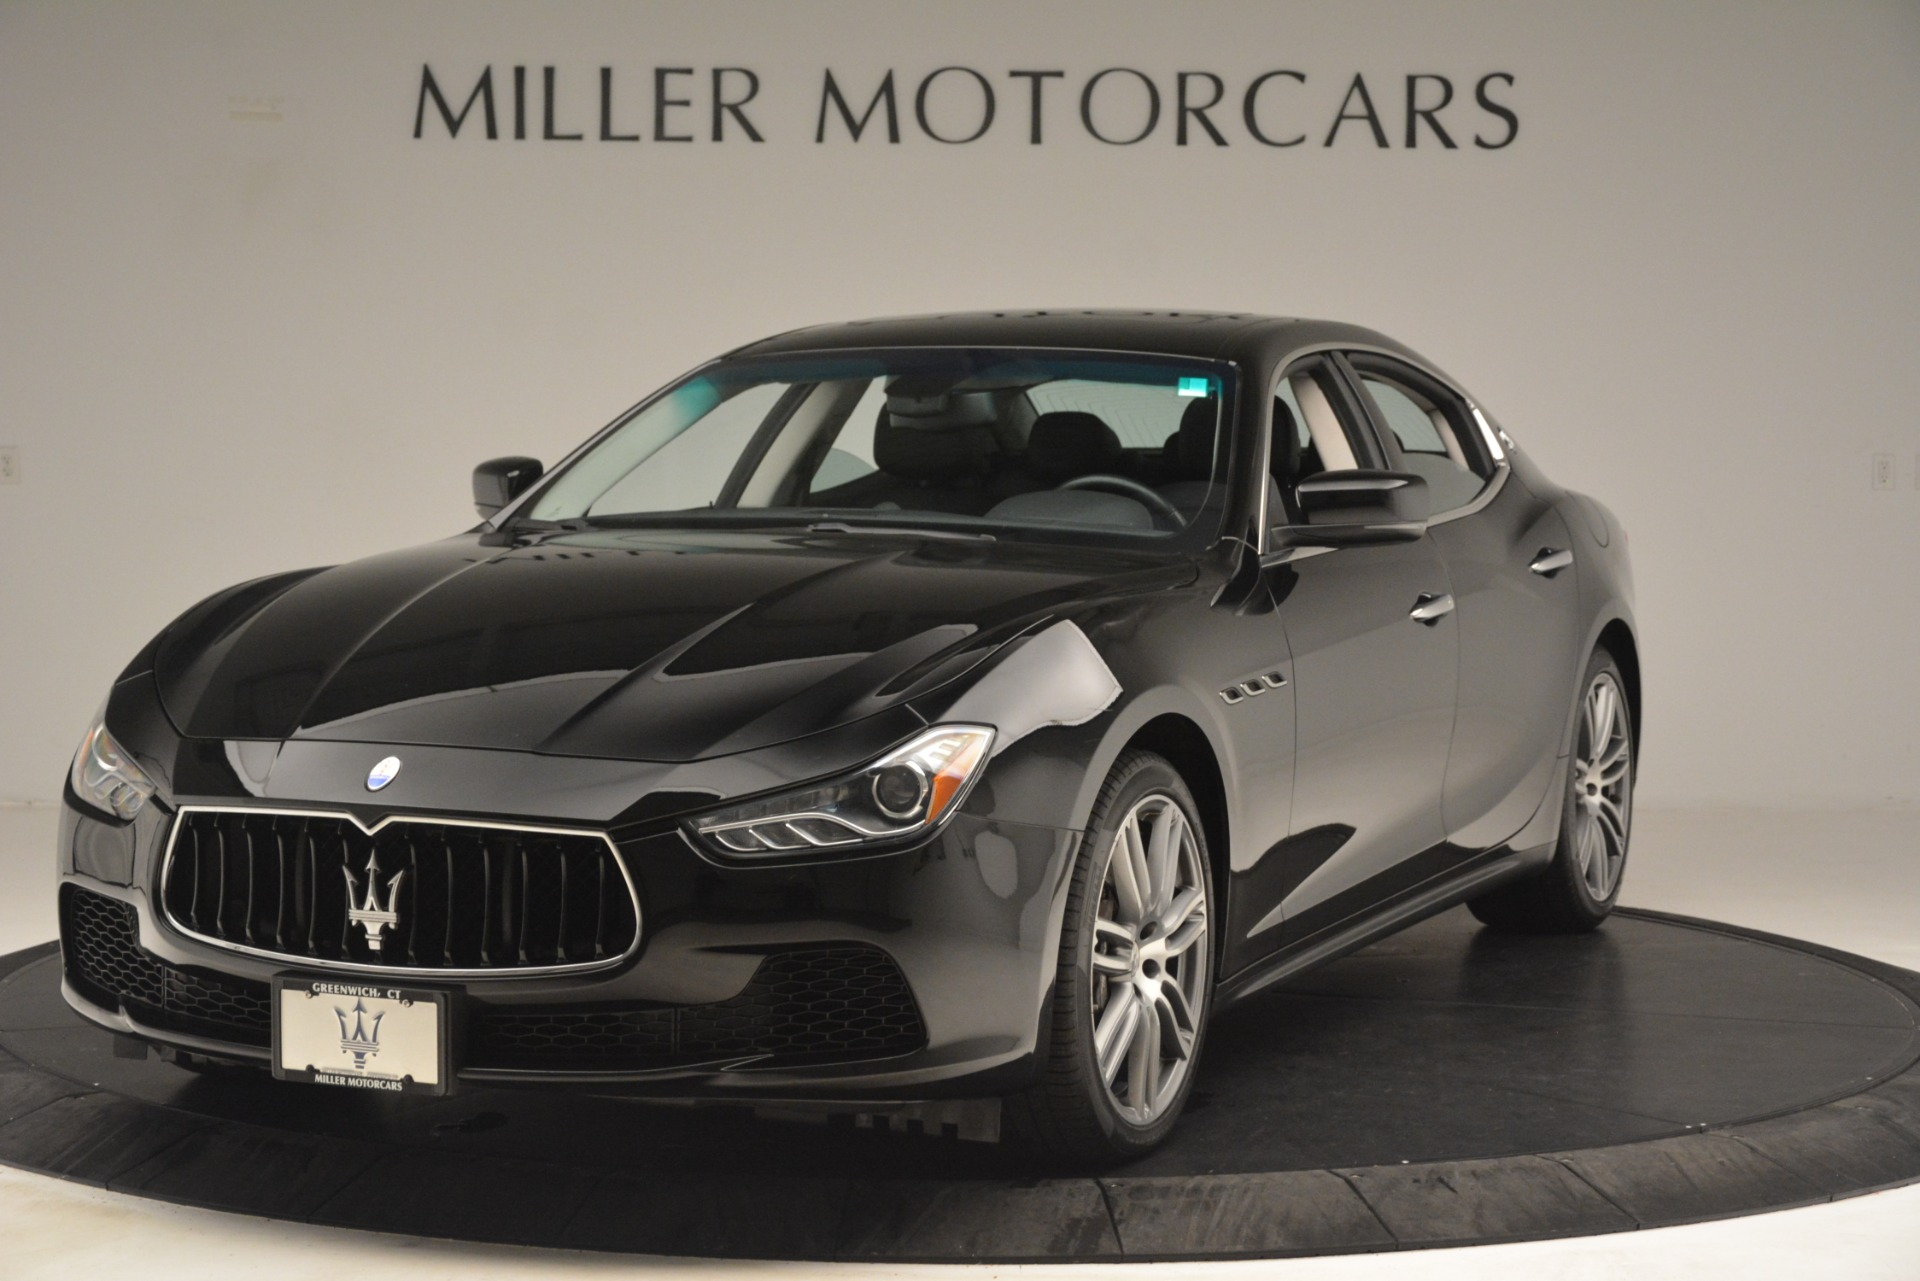 Used 2015 Maserati Ghibli S Q4 for sale Sold at Alfa Romeo of Greenwich in Greenwich CT 06830 1